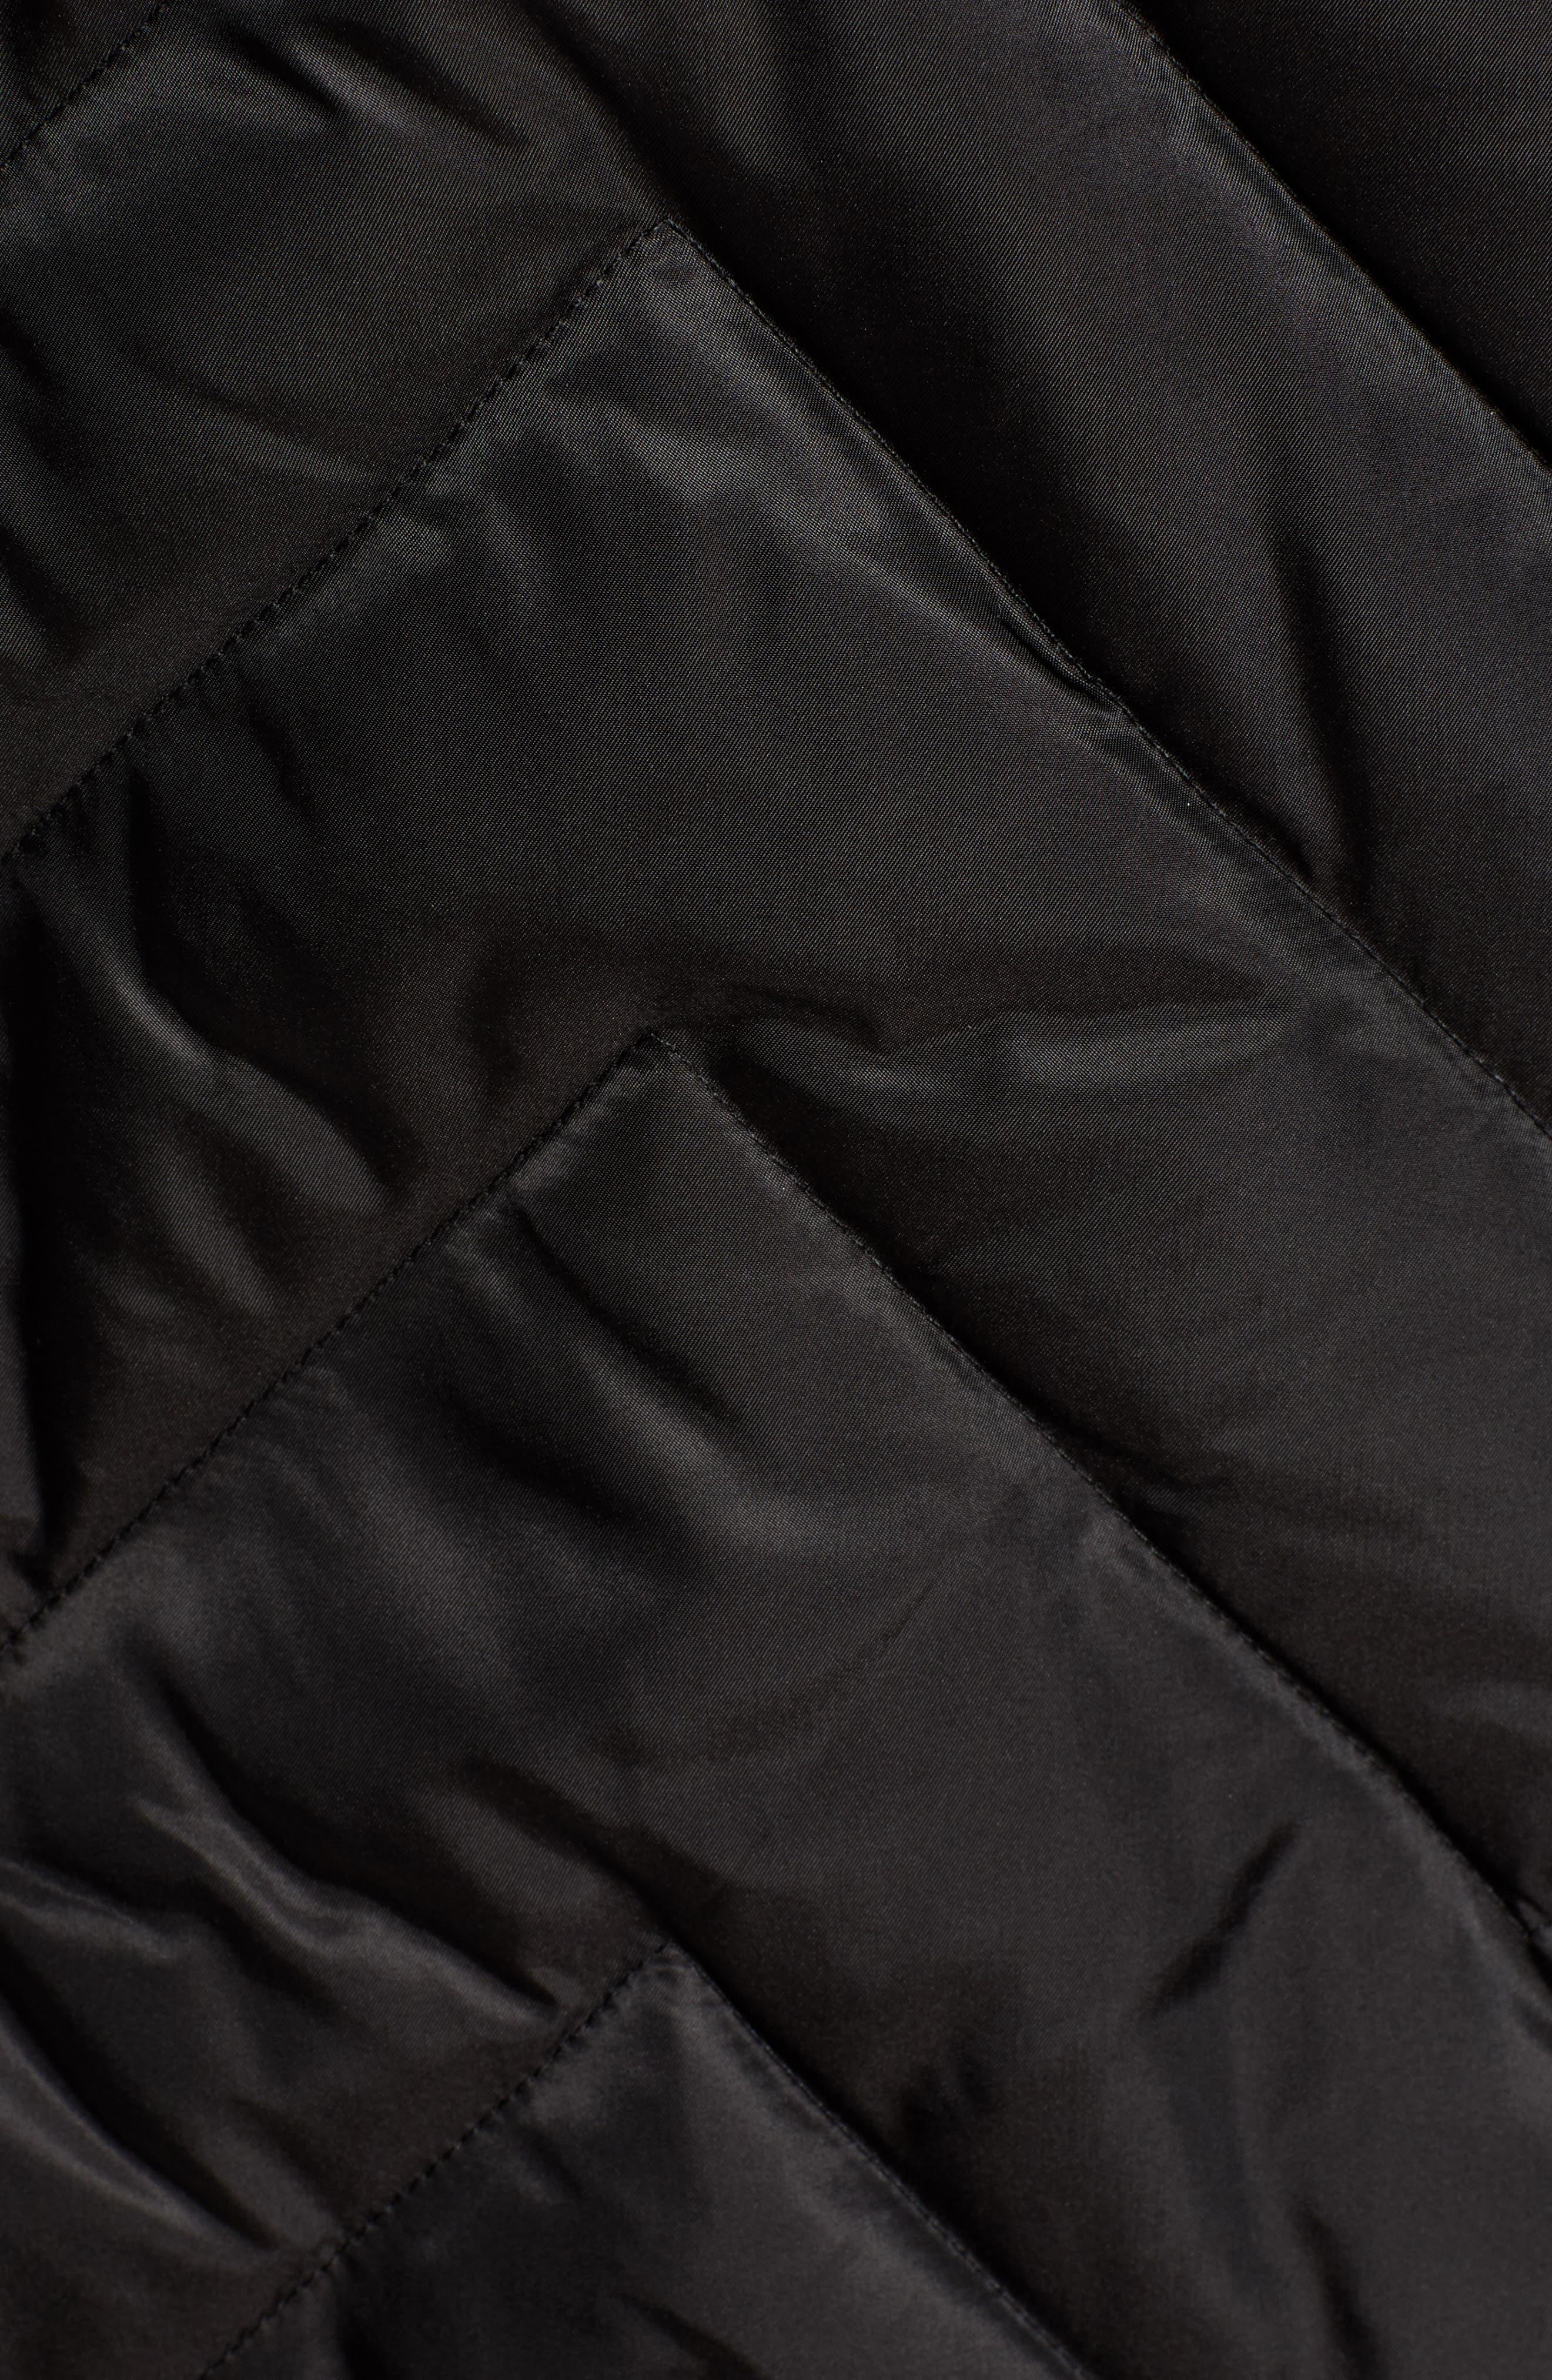 MARC NEW YORK, Matte Satin Chevron Faux Fur Trim Coat, Alternate thumbnail 7, color, BLACK